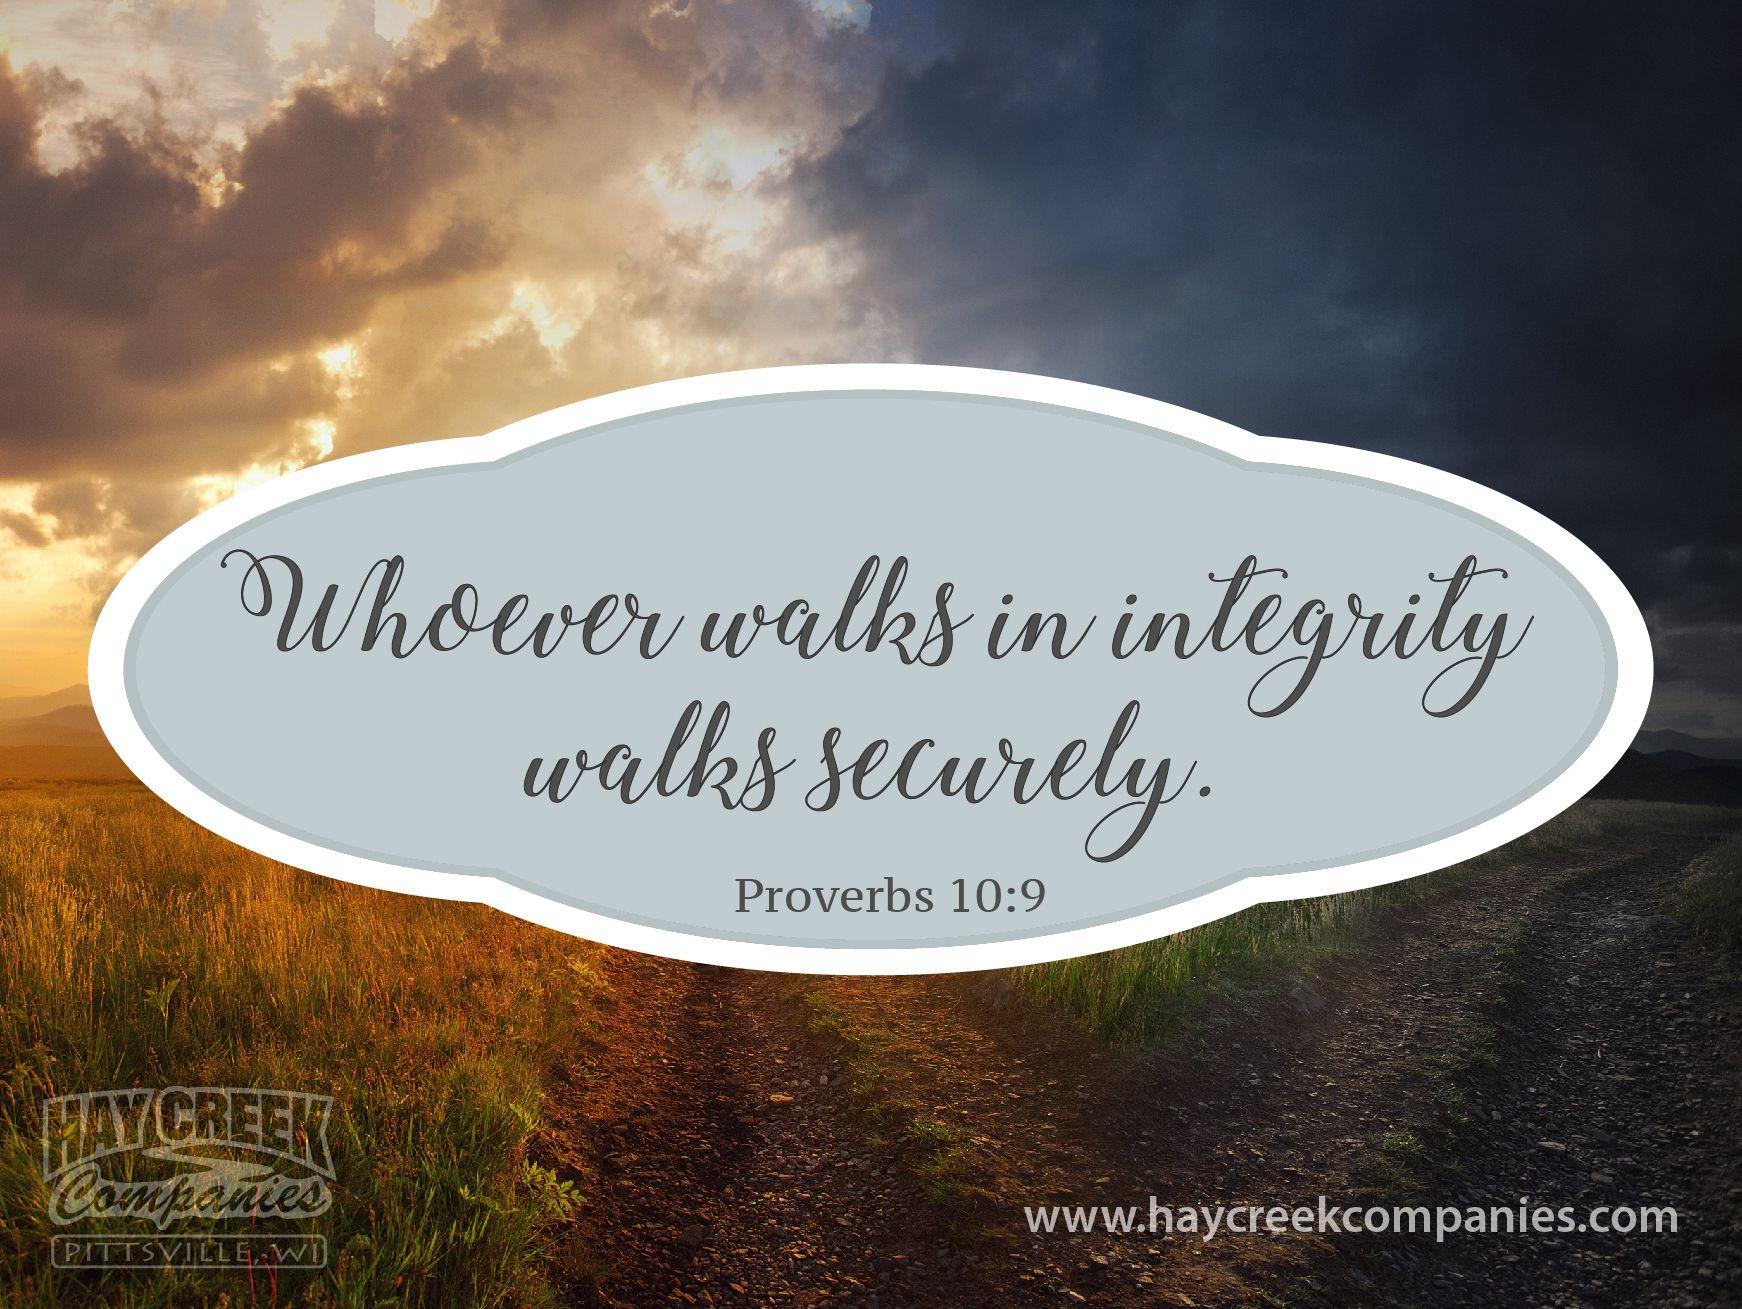 Proverbs 10 9 Proverbs 10 Wood Pellets Proverbs